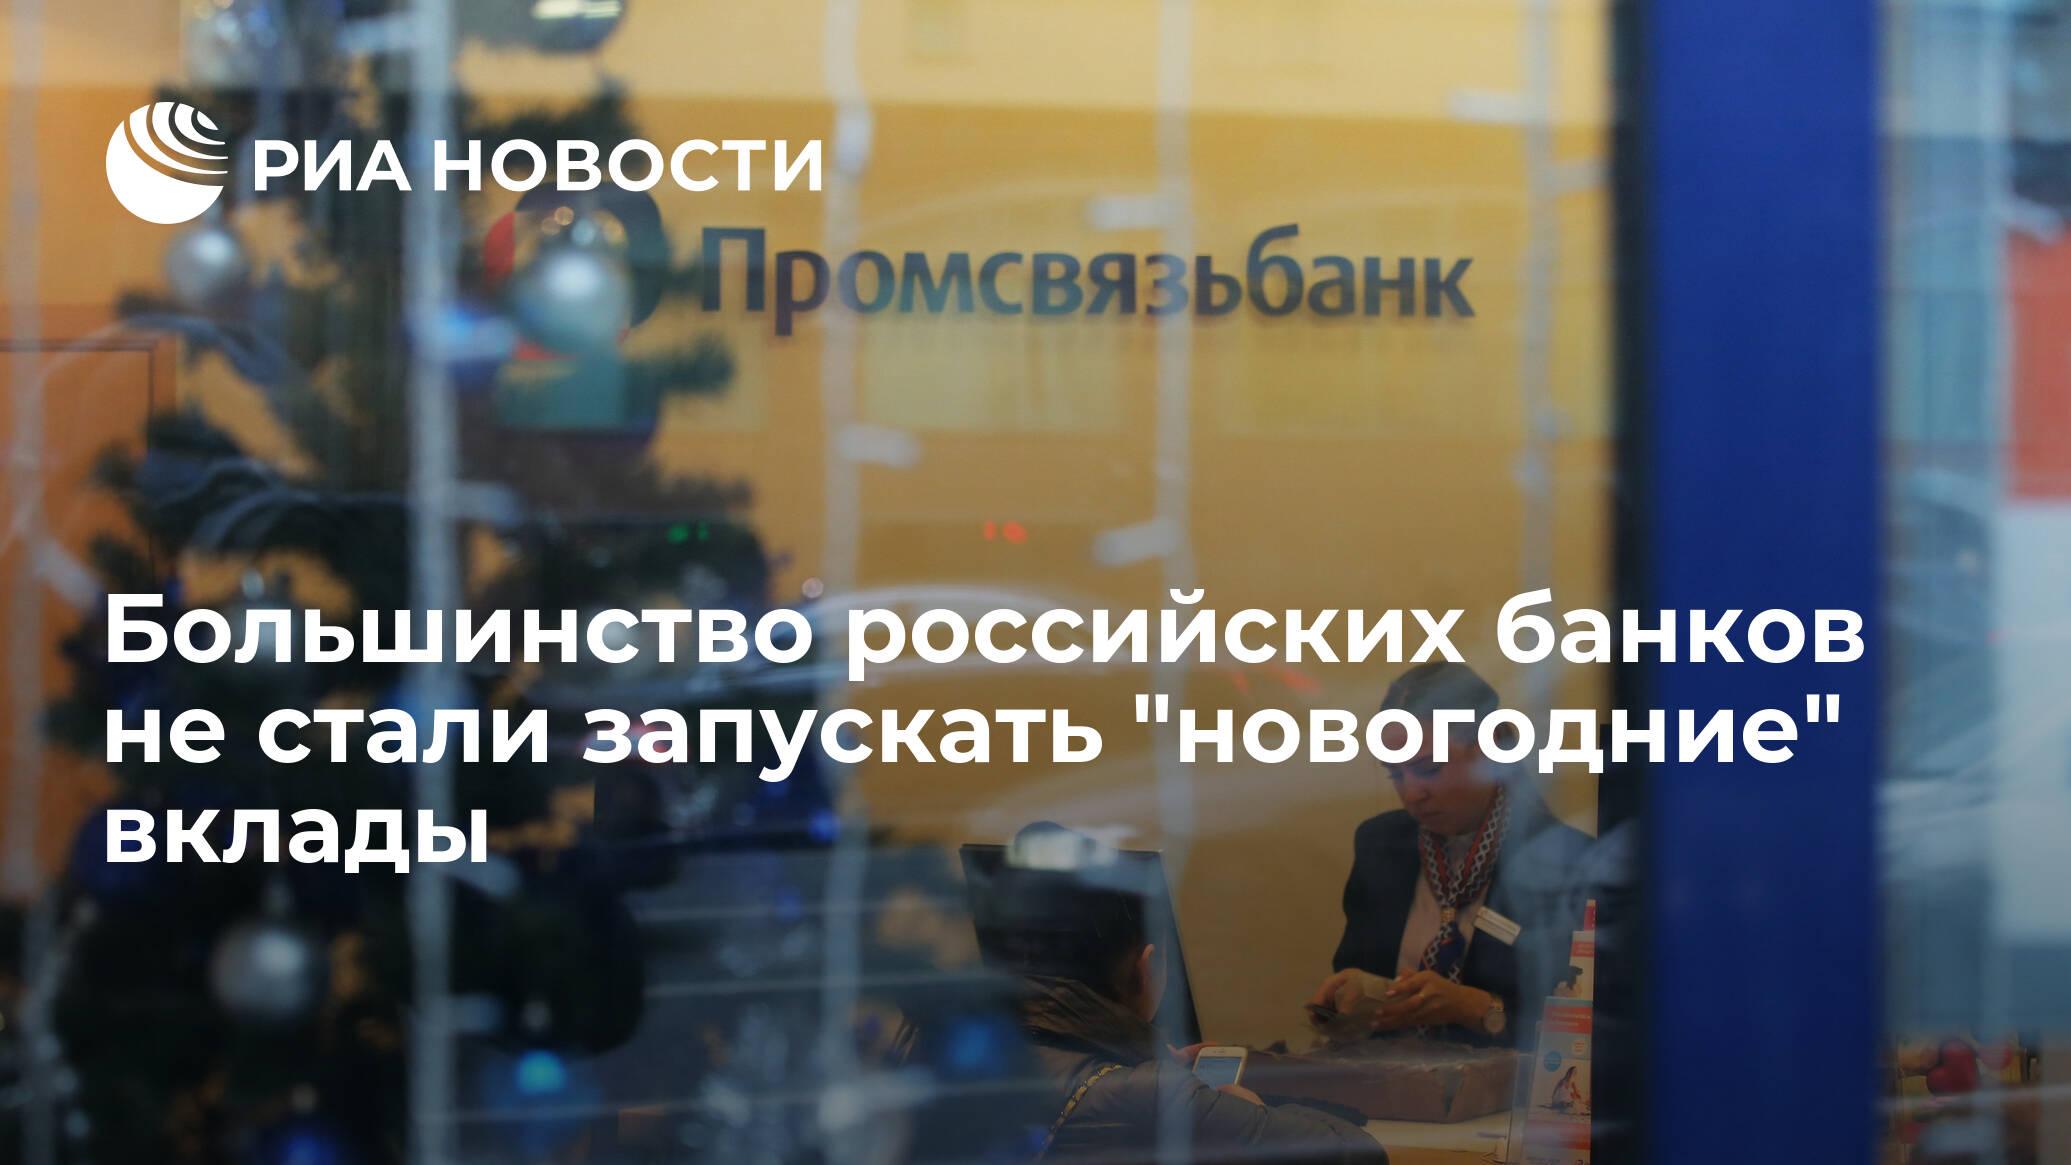 кредит онлайн заявка с плохой кредитной историей vam-groshi.com.ua